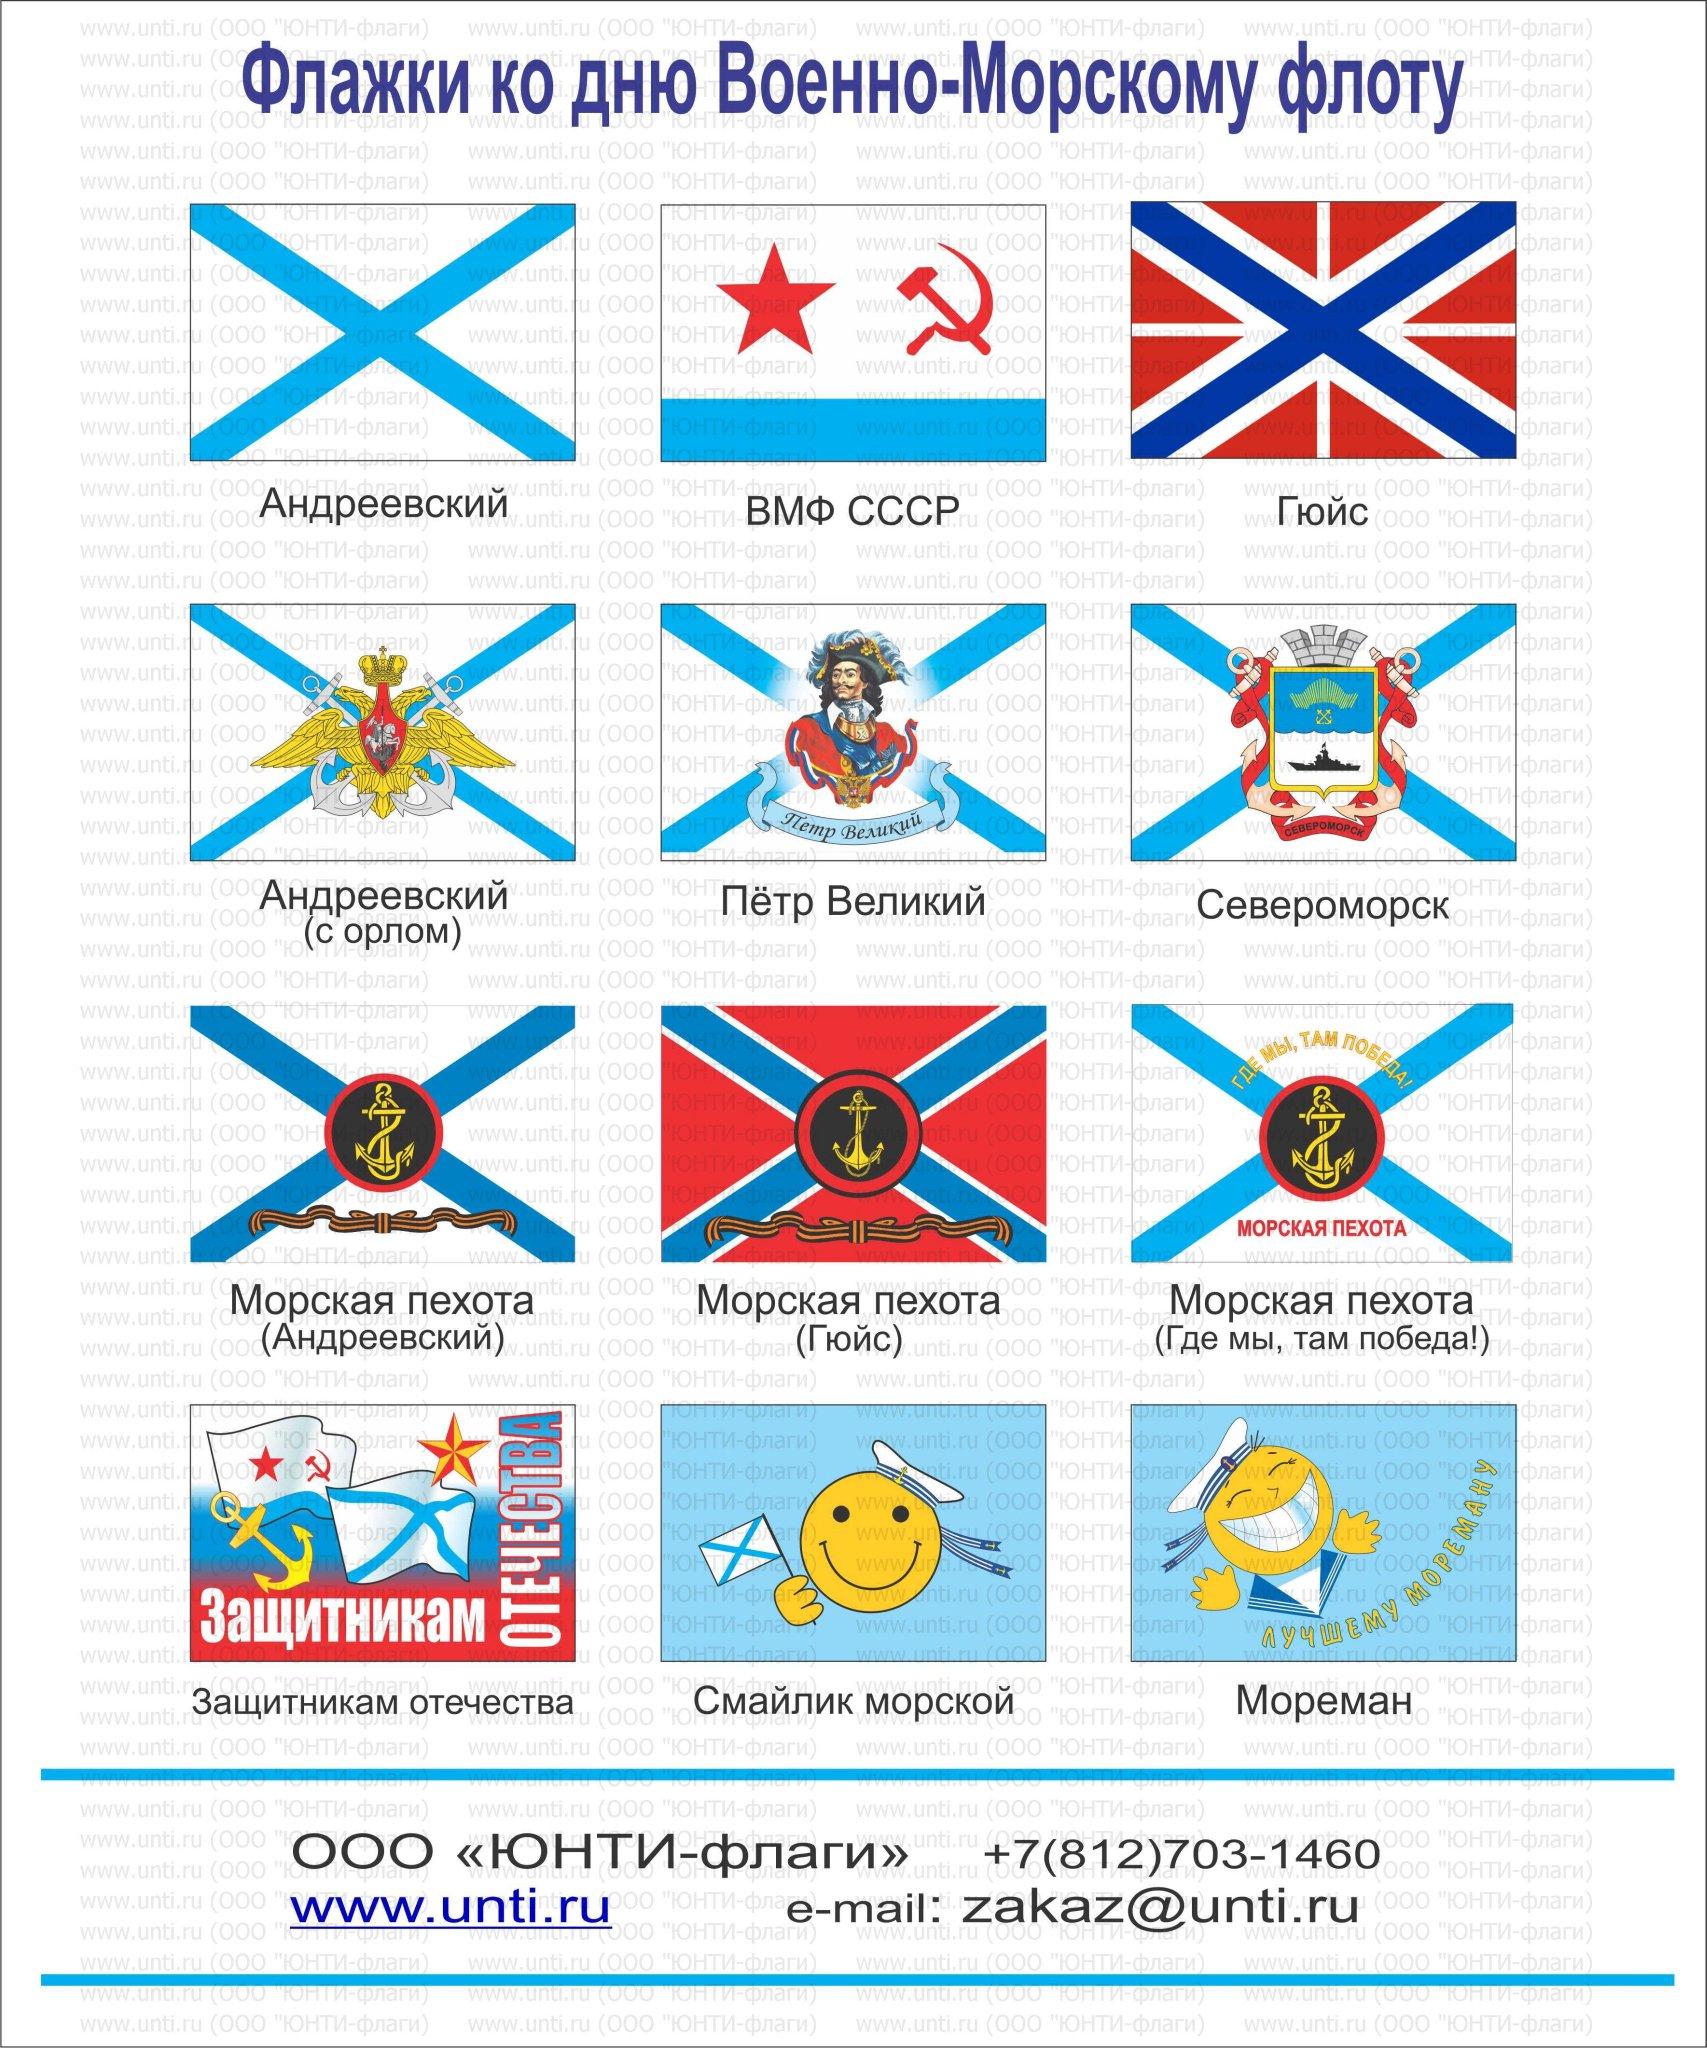 могут флаги вмф россии значения песен песни